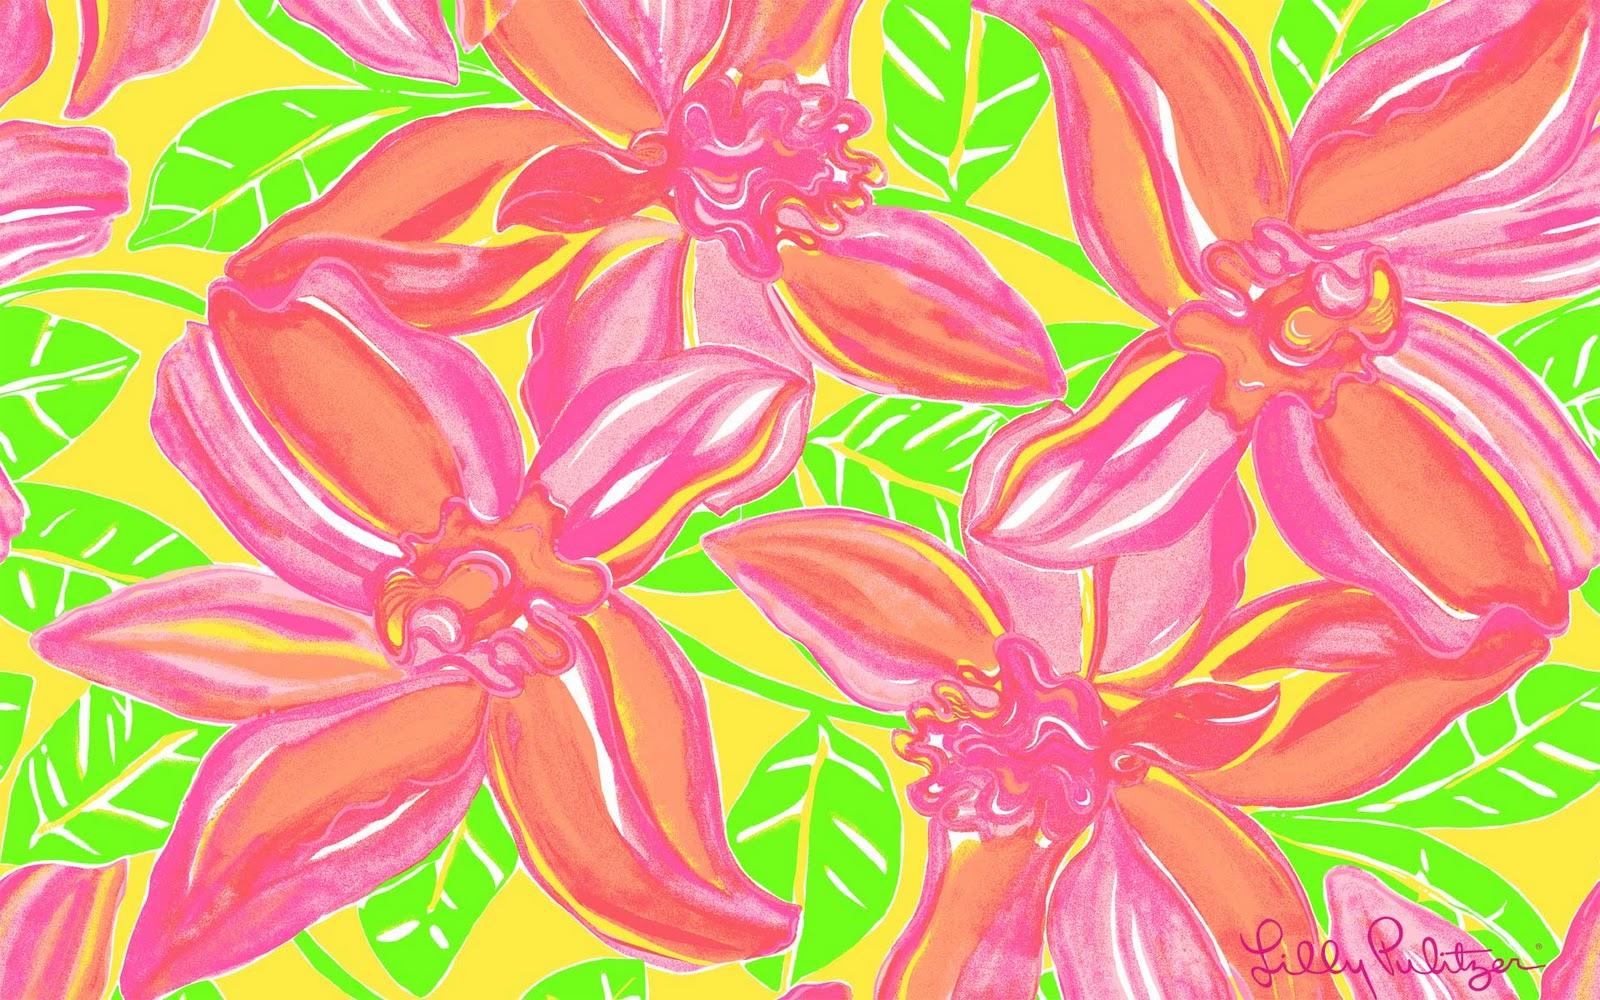 httpwwwmarketwallpaperscomsearch wallpaperslillypulitzerhtml 1600x1000